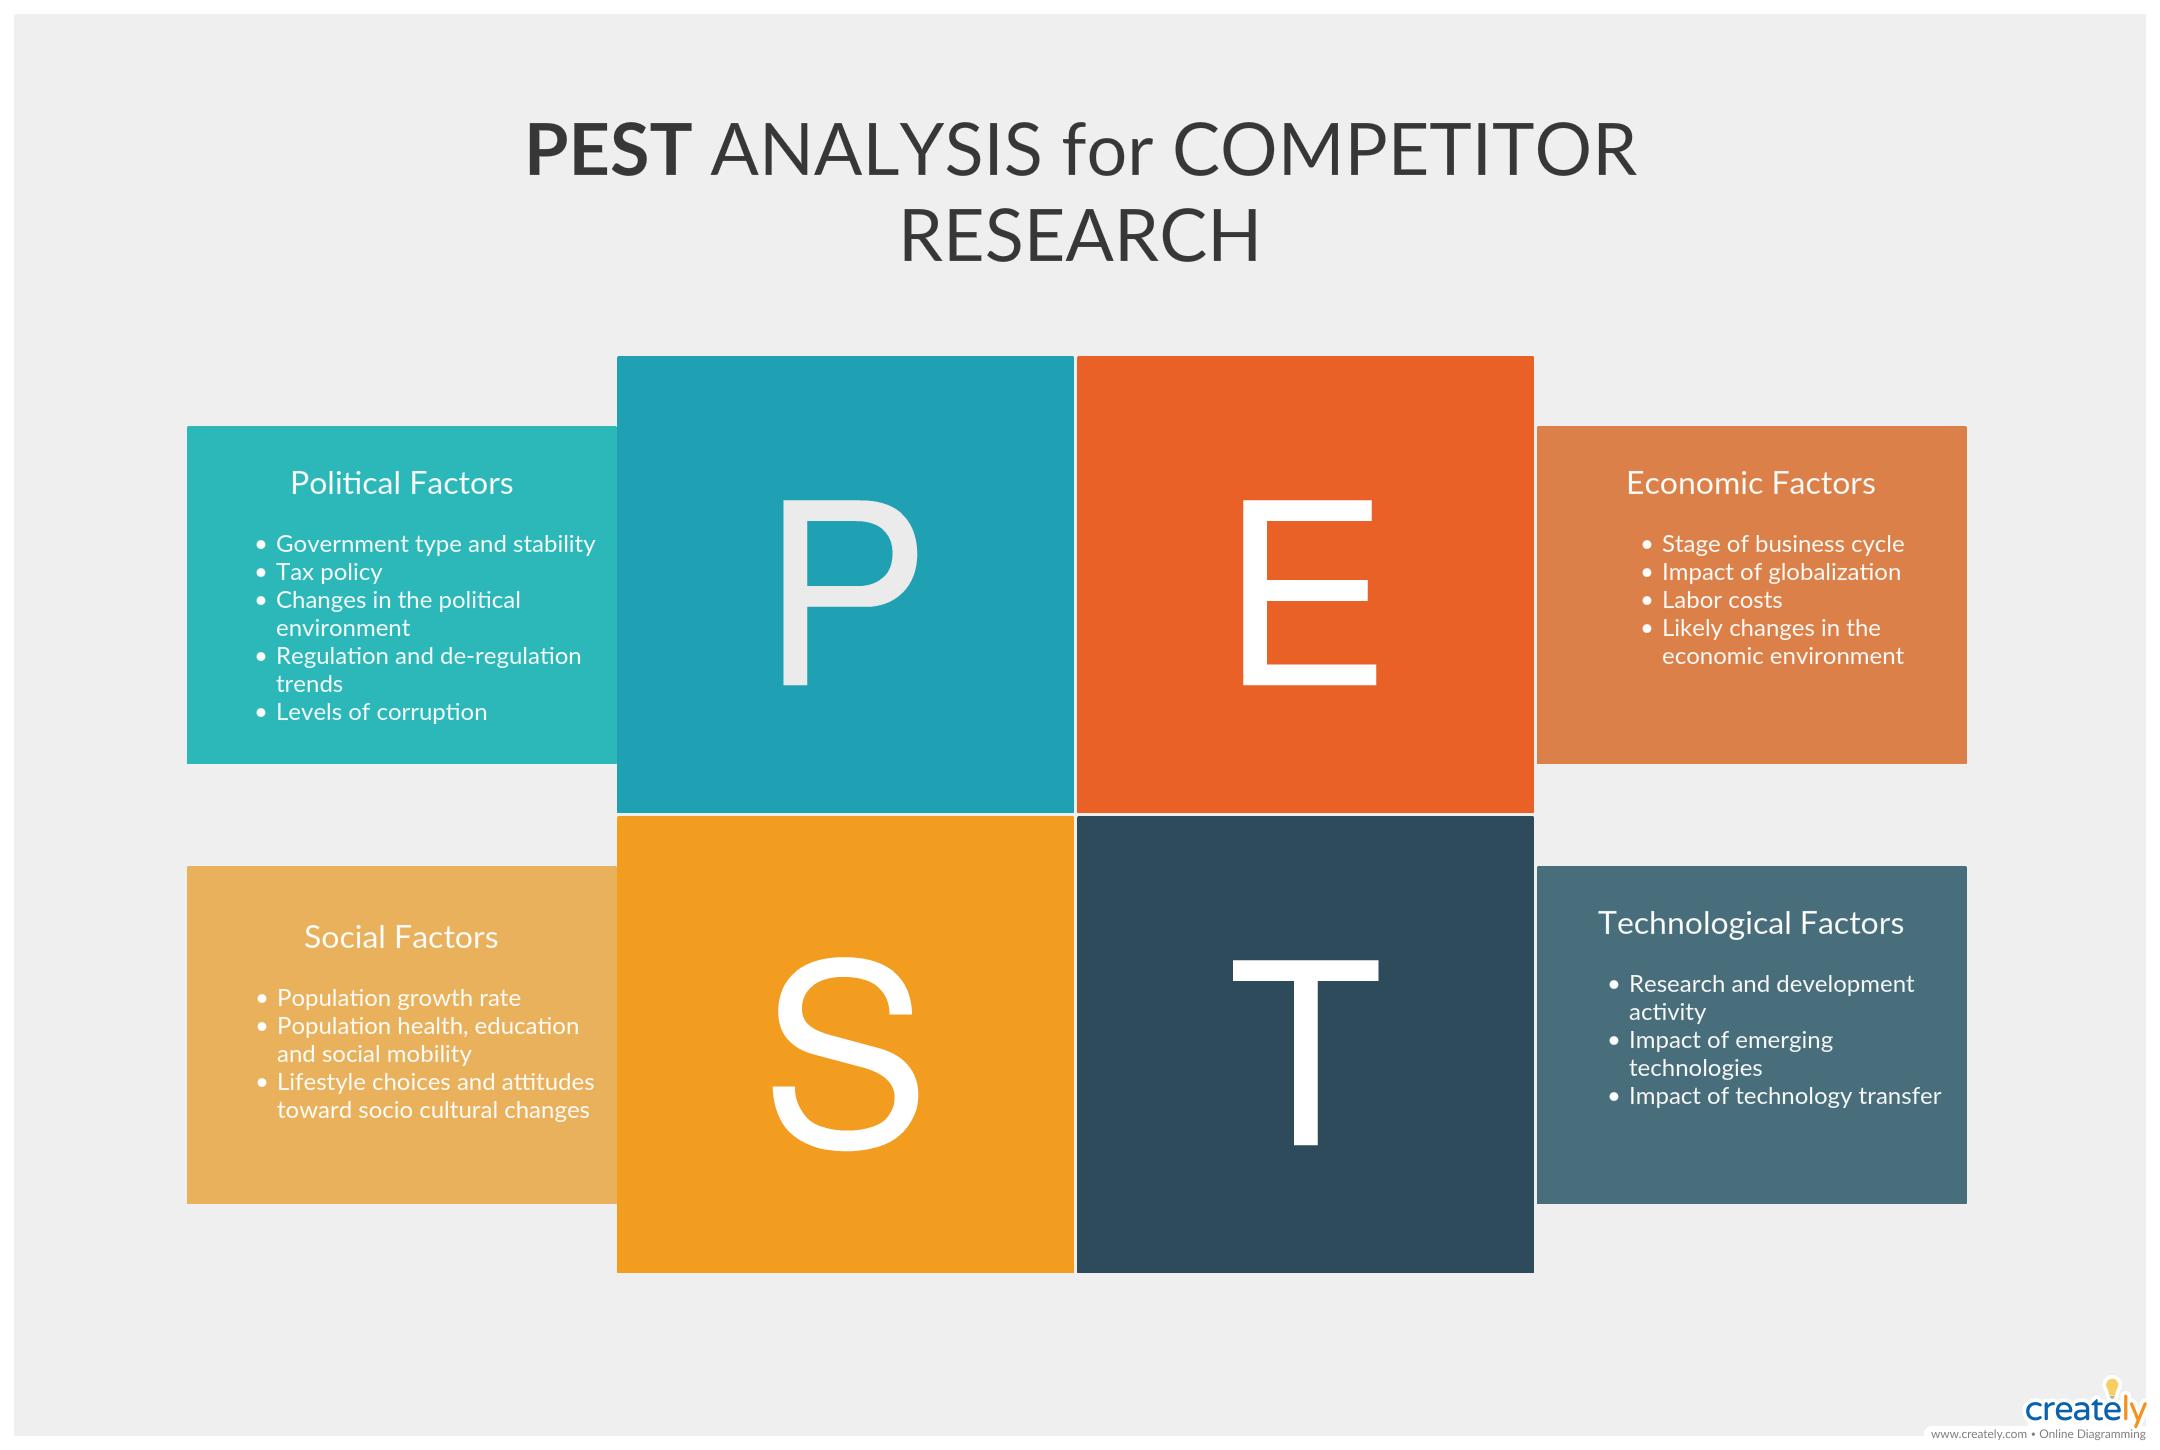 36 Pest Analysis Templates Ideas In 2021 Macro Environmental Factors Analysis New Directions